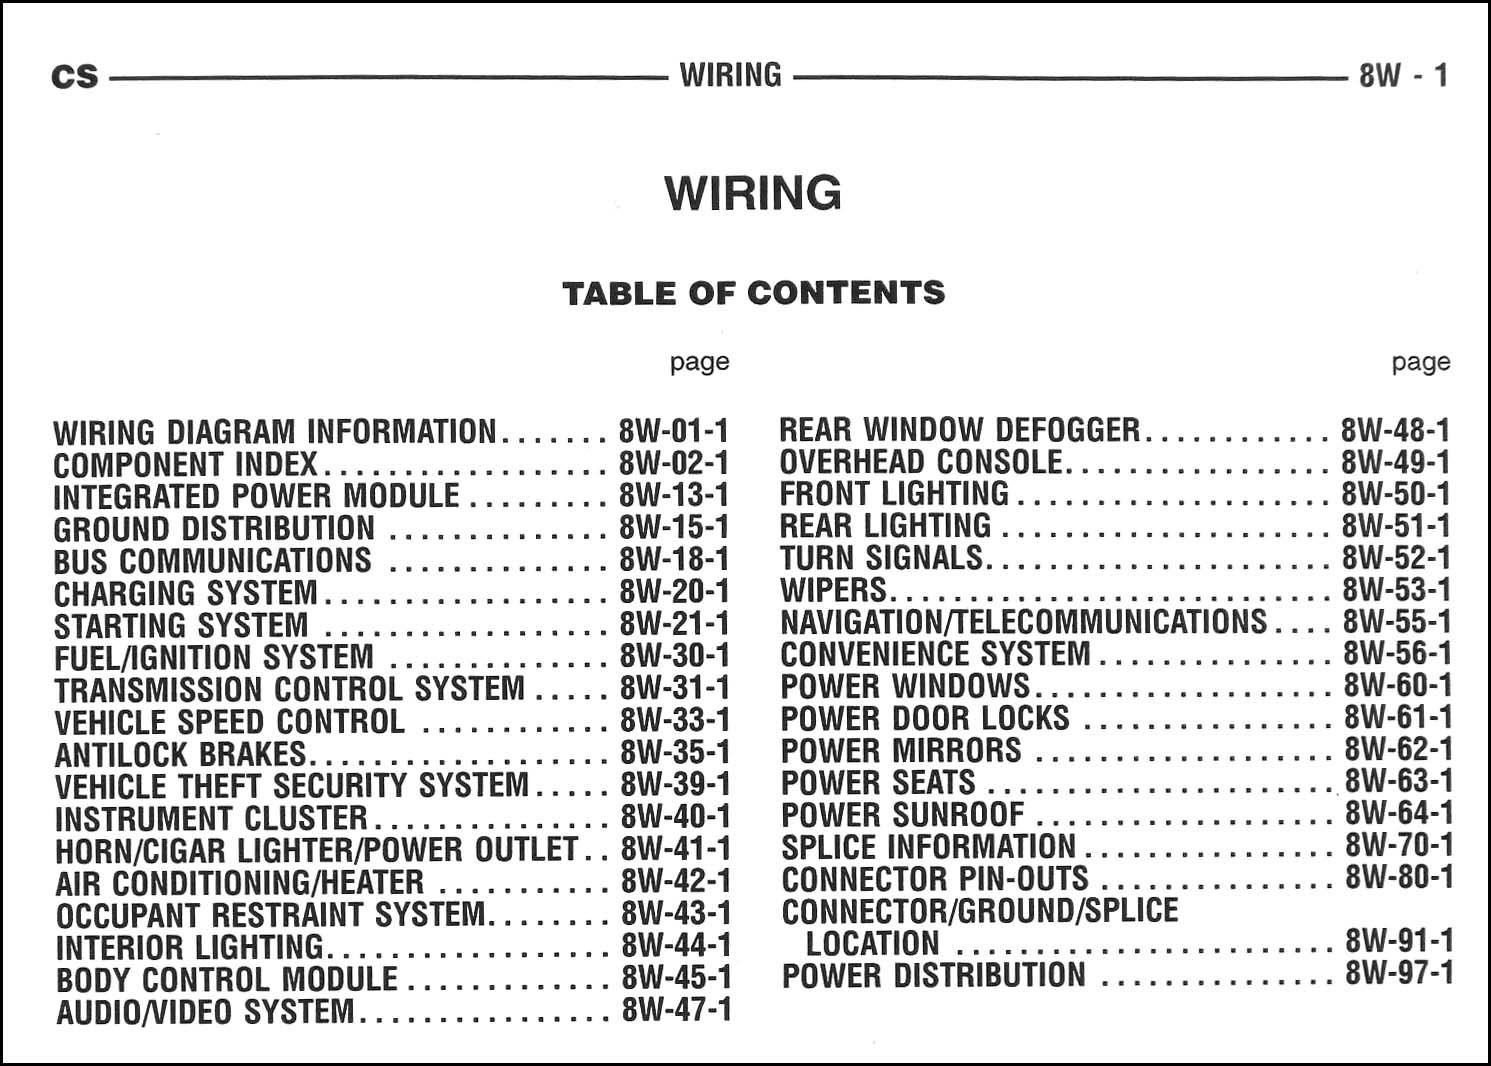 2005 Chrysler Pacifica Wiring Diagram Manual Original - Mopar Wiring Diagram